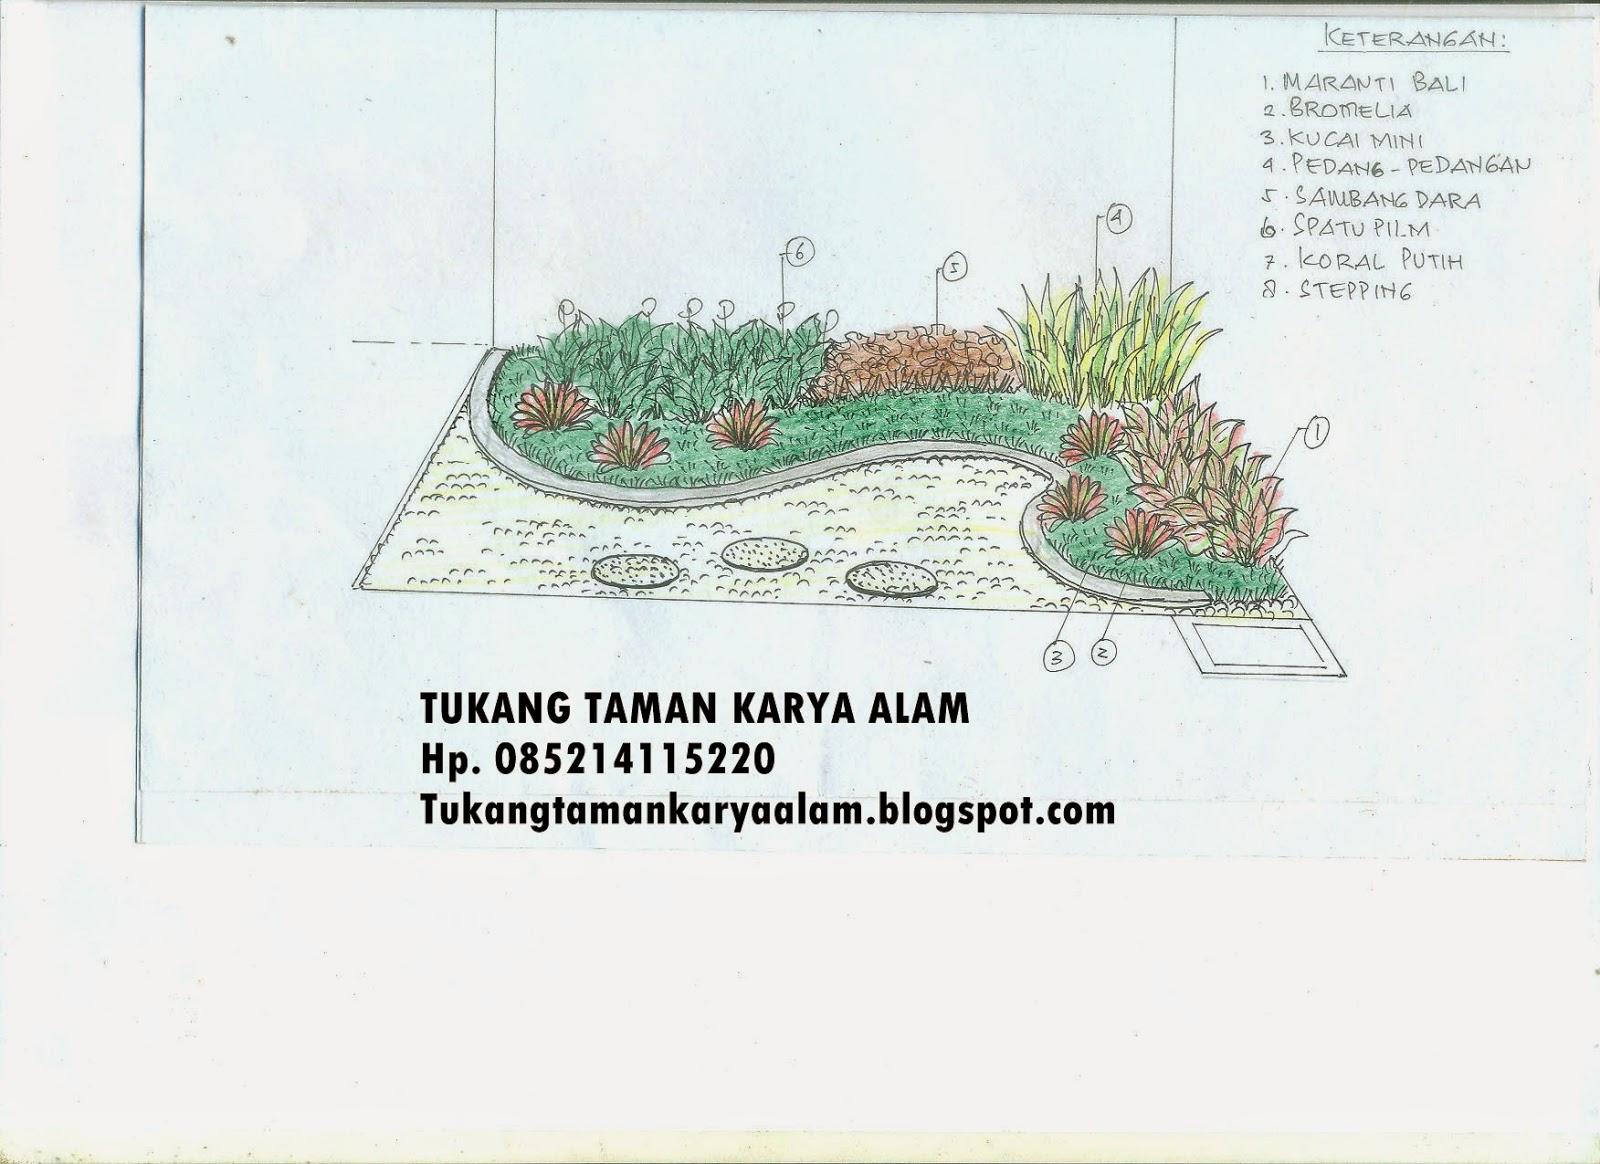 http://tukangtamankaryaalam.blogspot.com/2014/11/jasa-konstruksi-taman-desain-taman.html